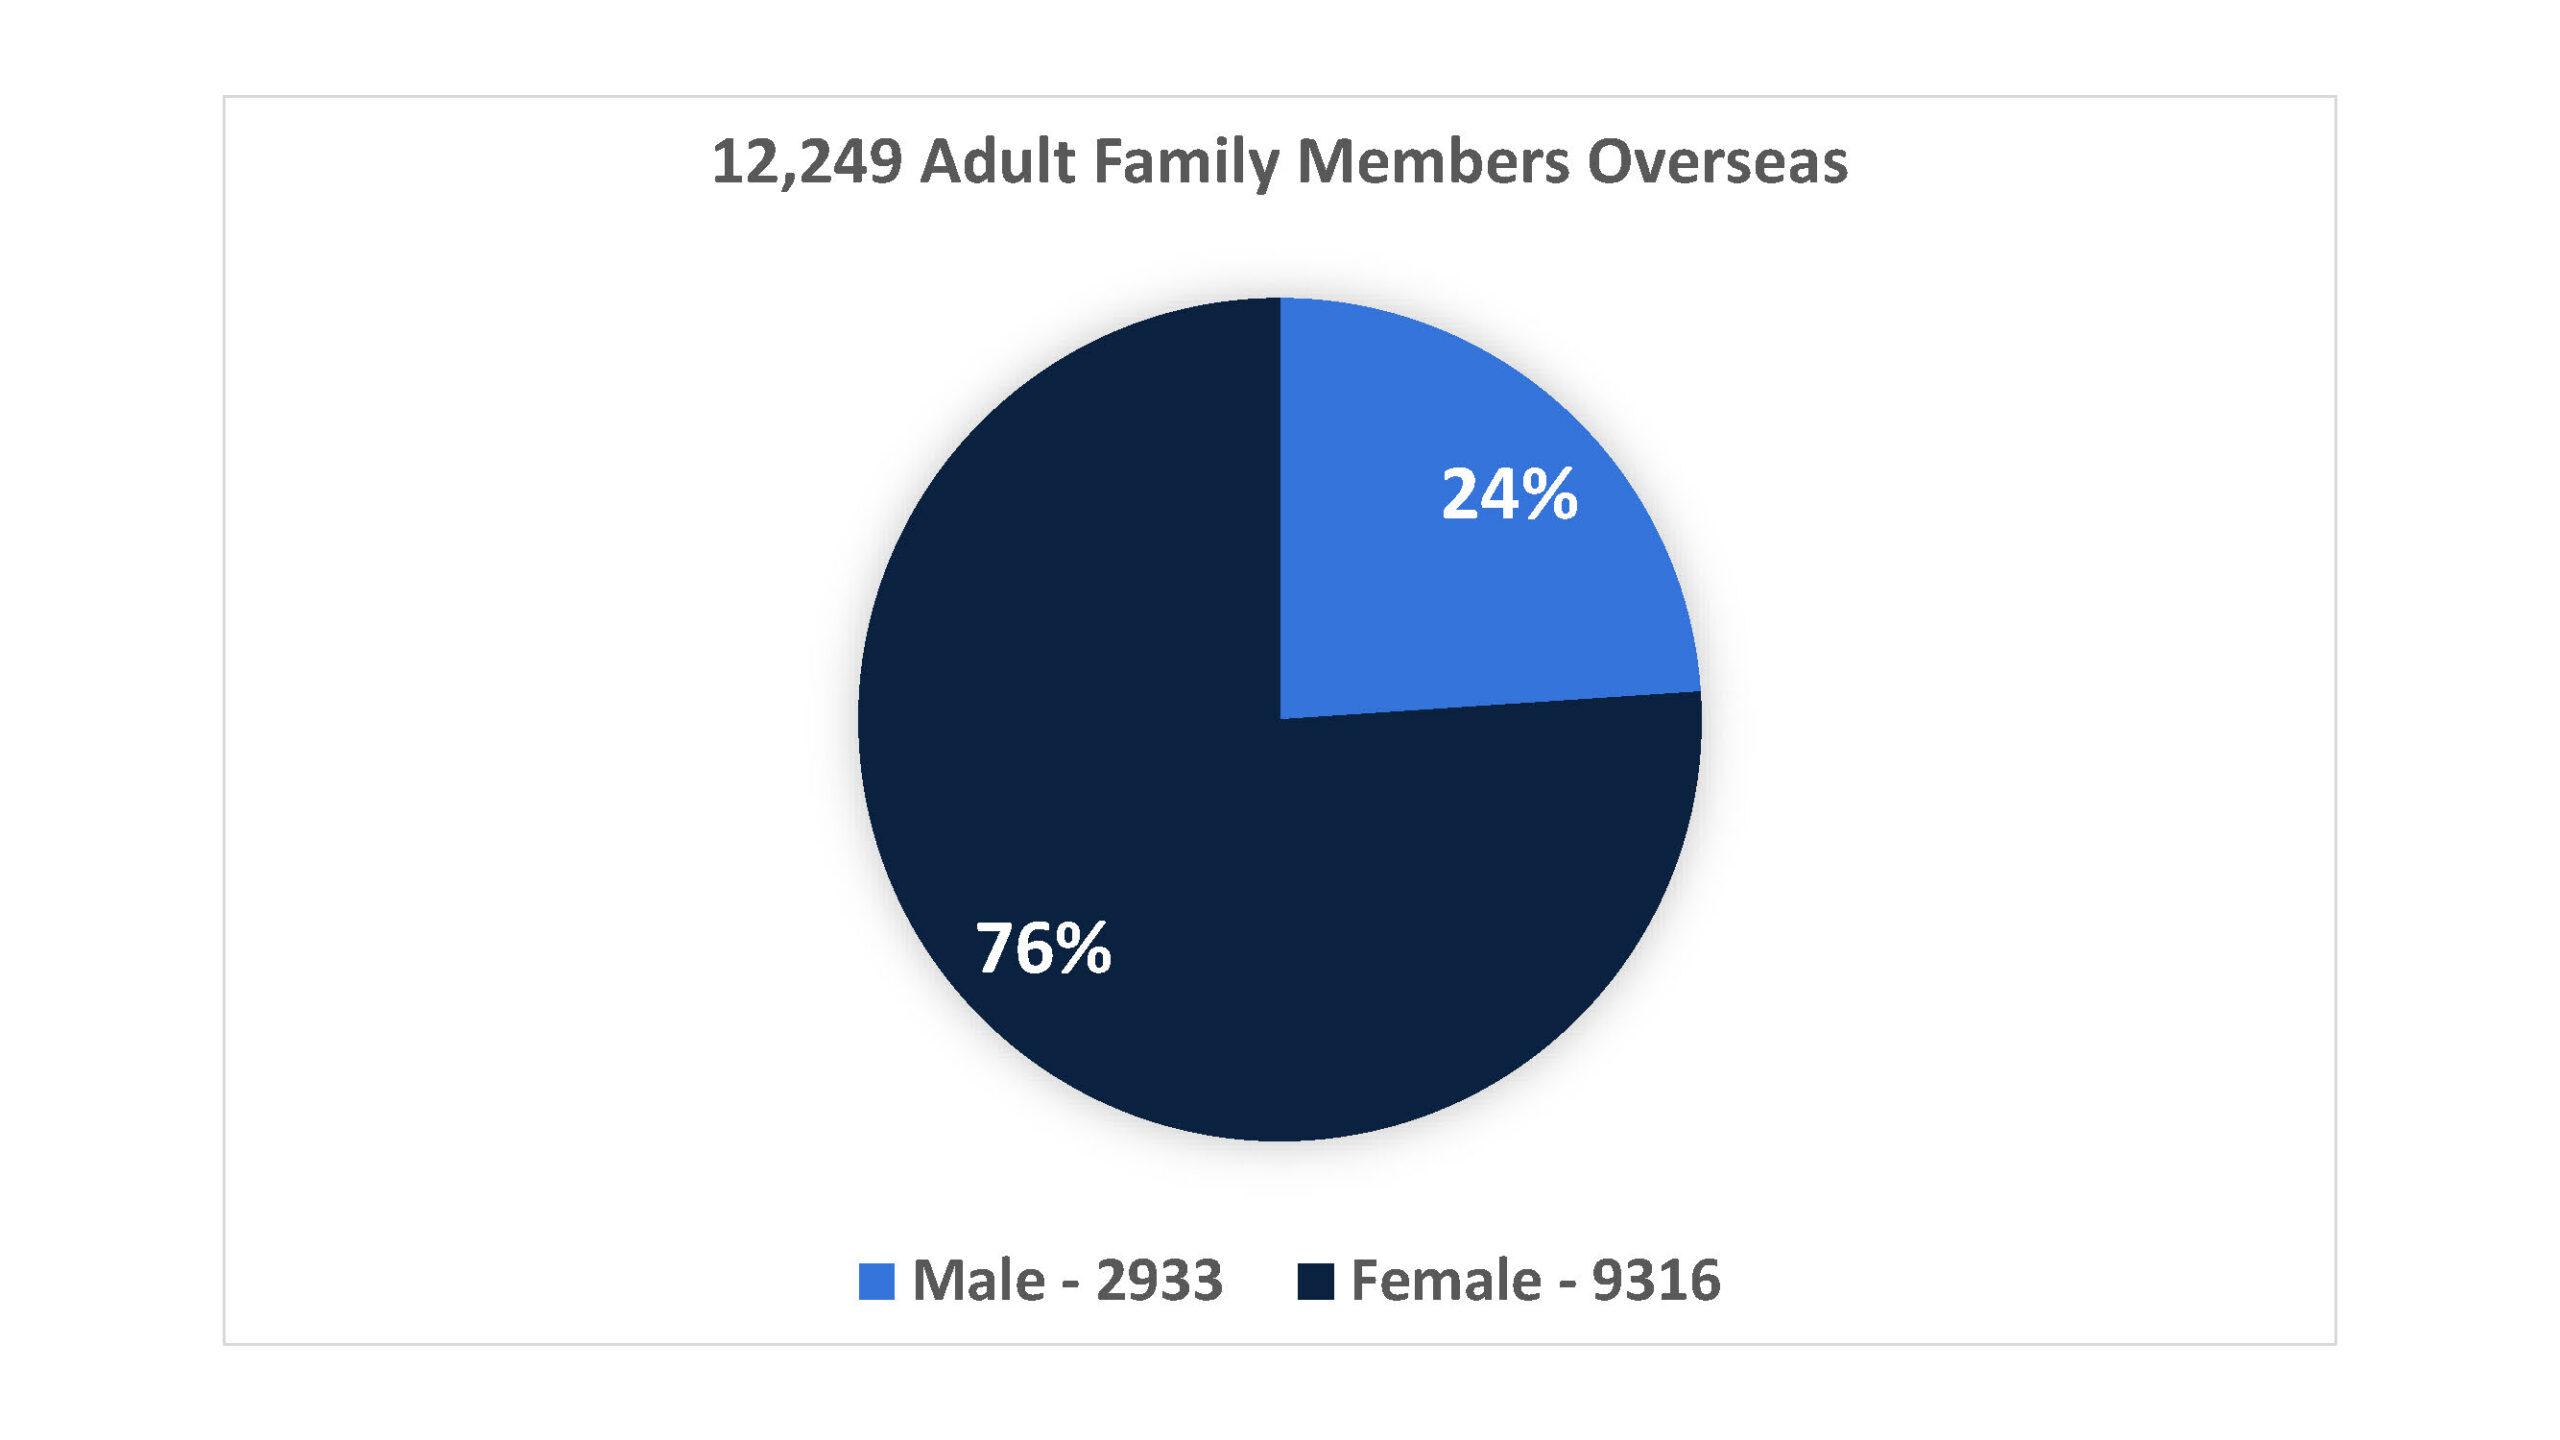 12,249 Family Member Population Overseas